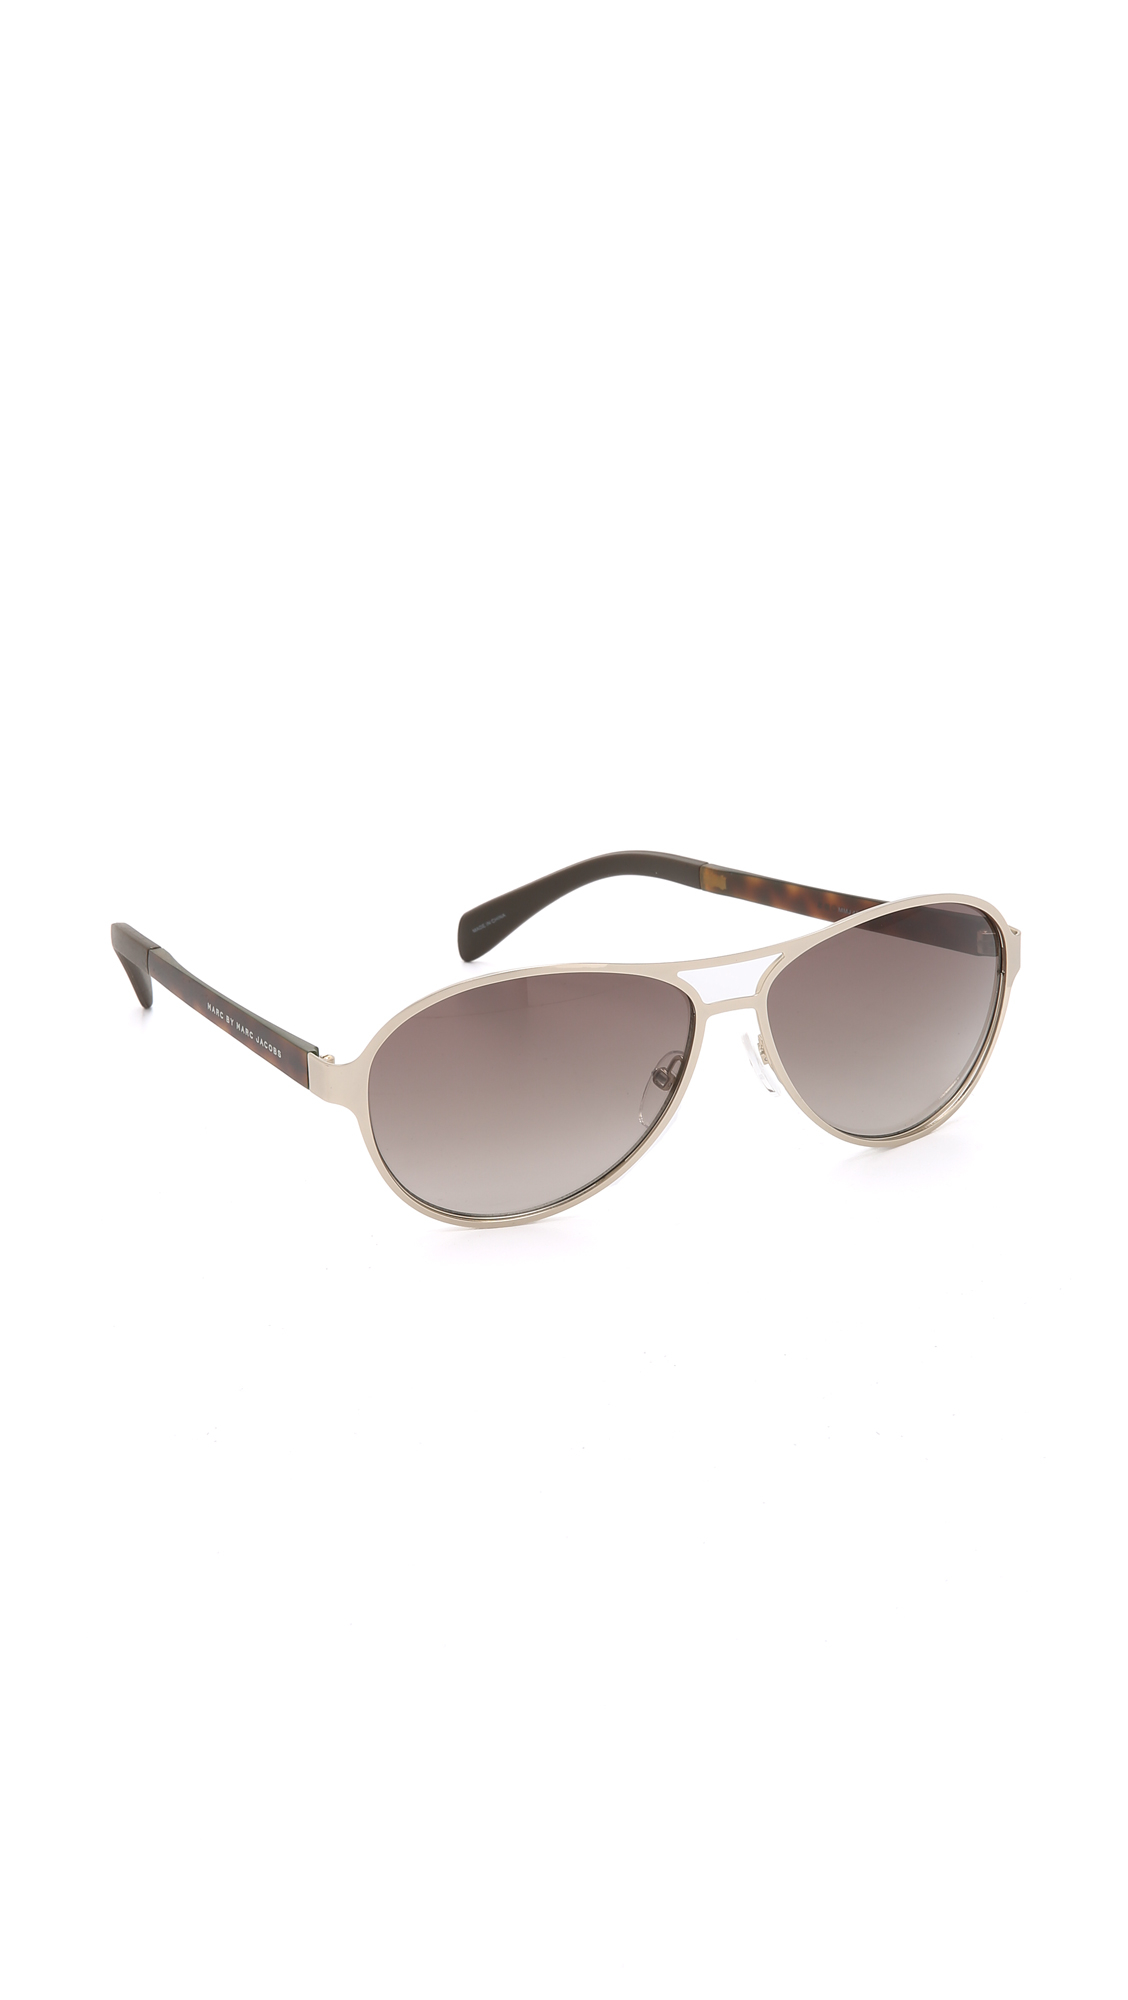 6ddc8c460 Marc By Marc Jacobs Aviator Sunglasses - Gold Havana/brown Gradient ...